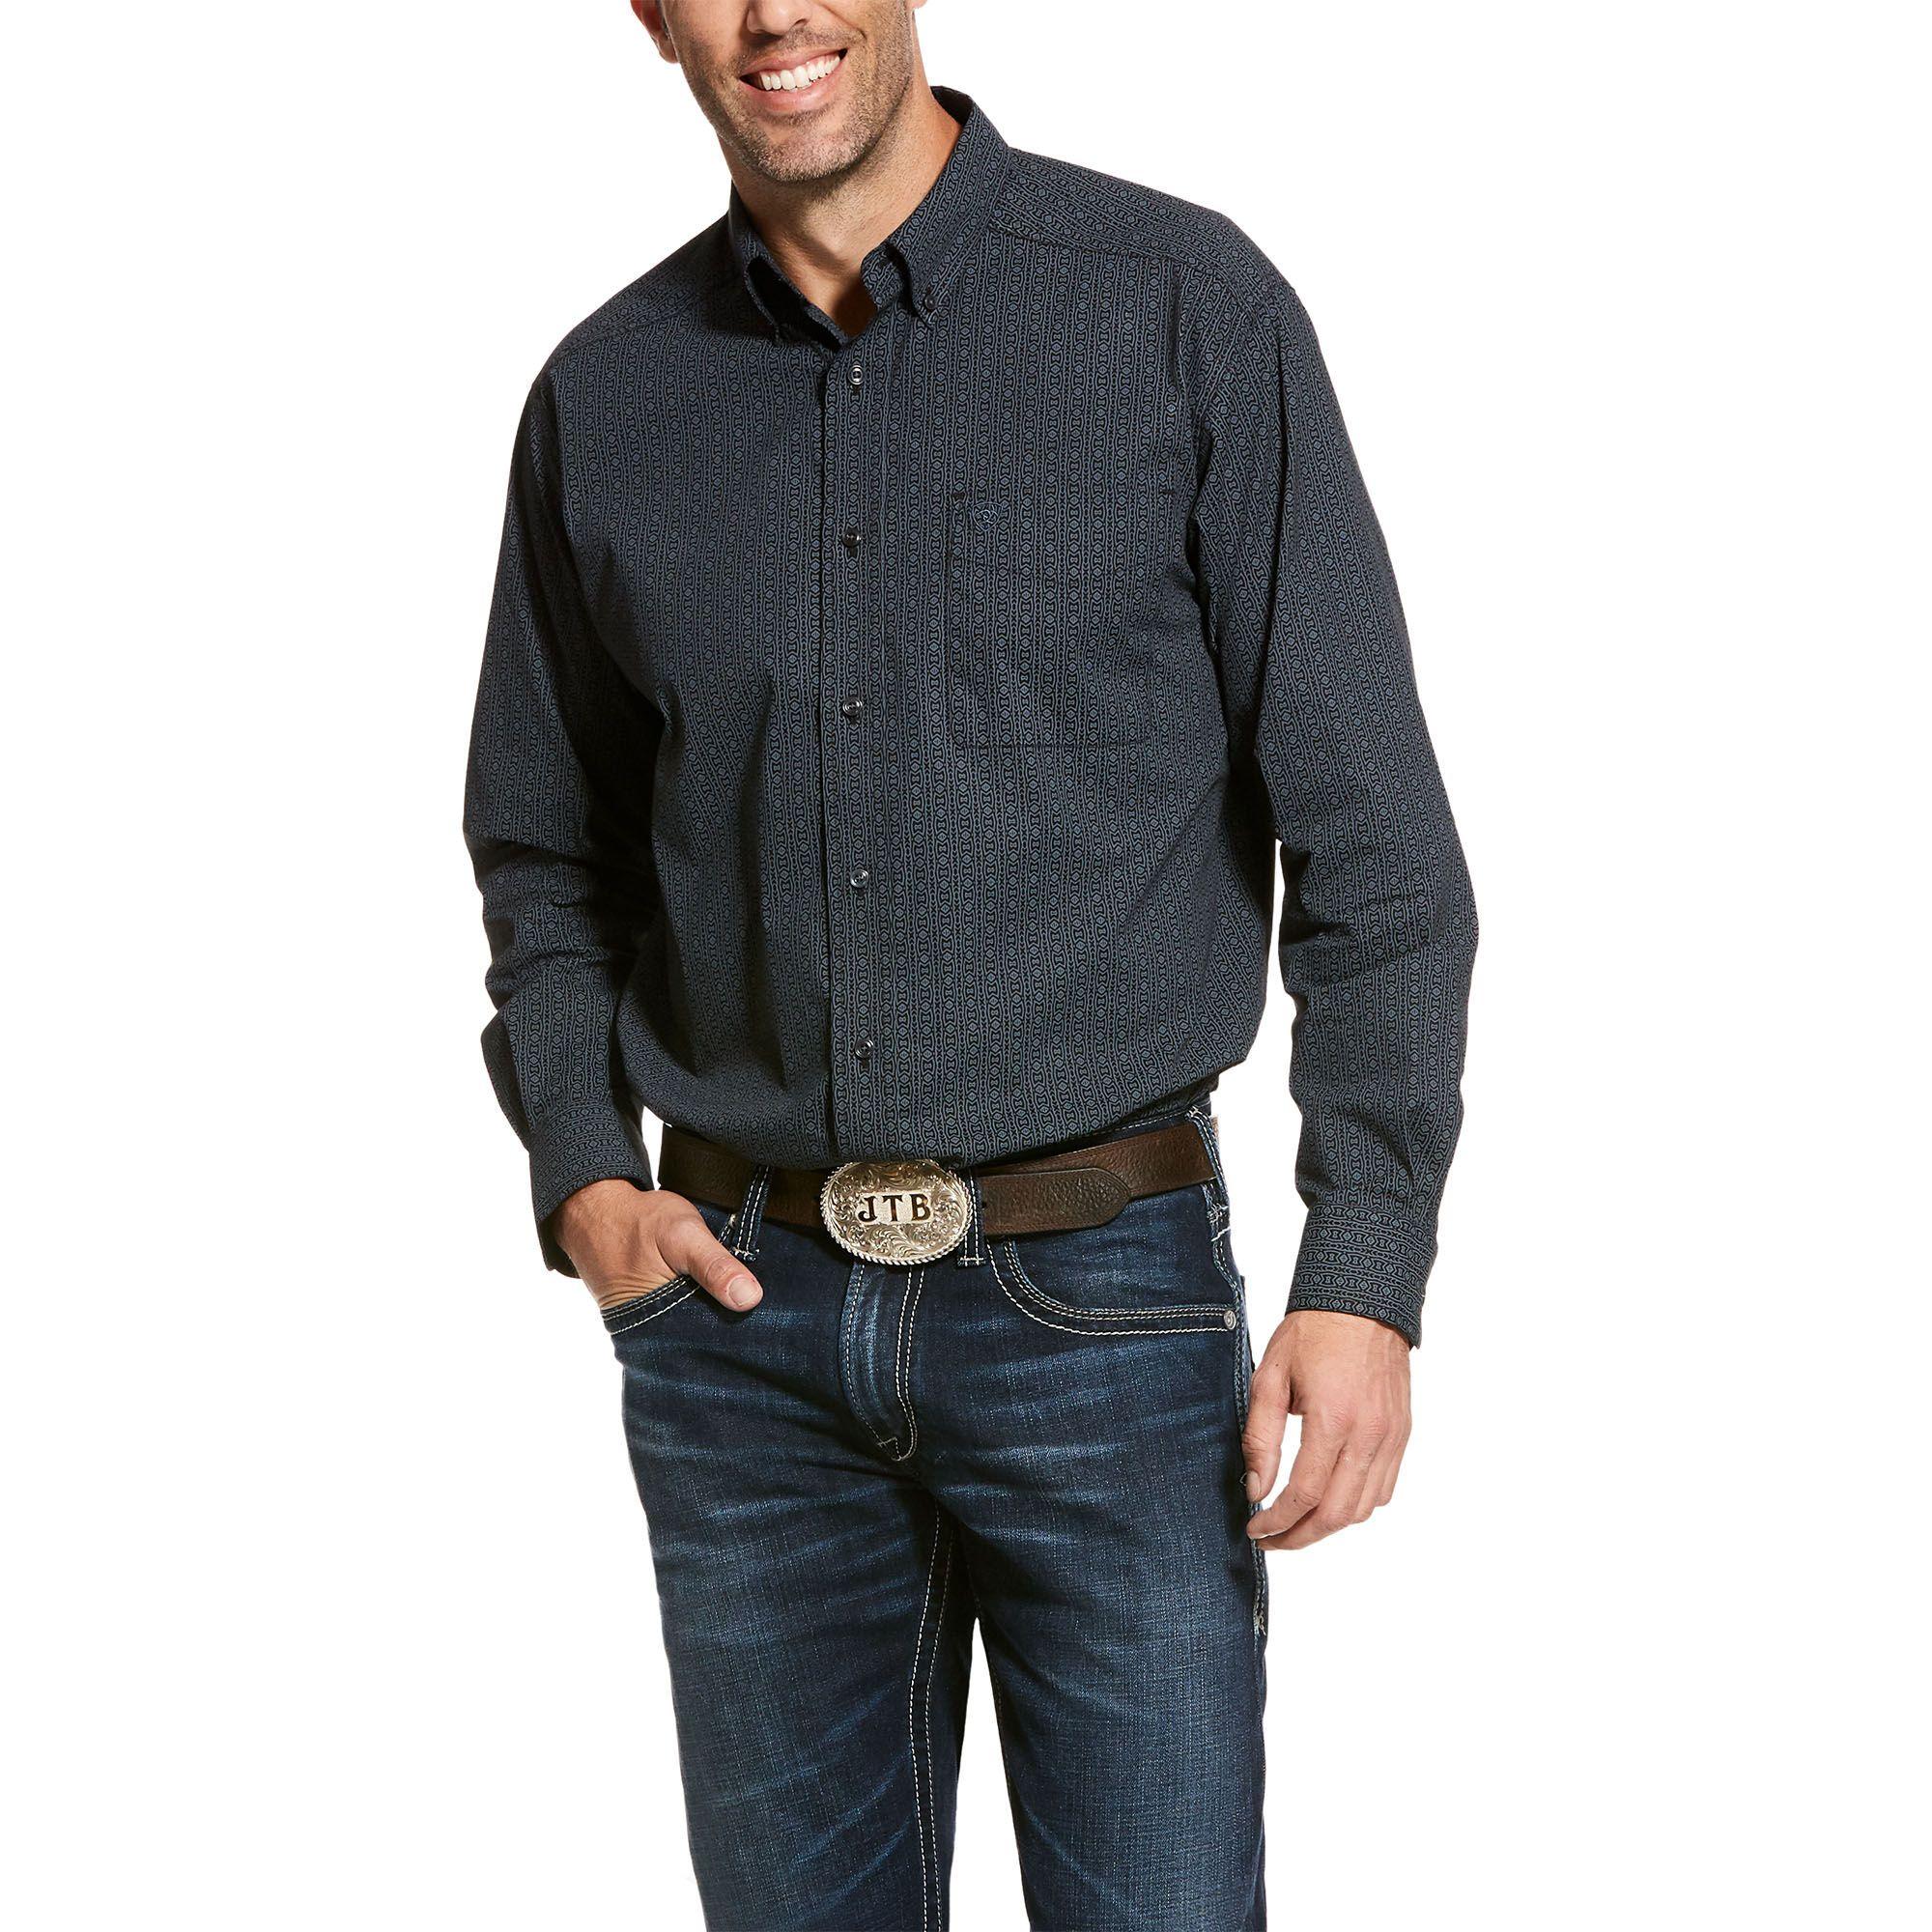 ARIAT Mens Classic Fit Long Sleeve Shirt